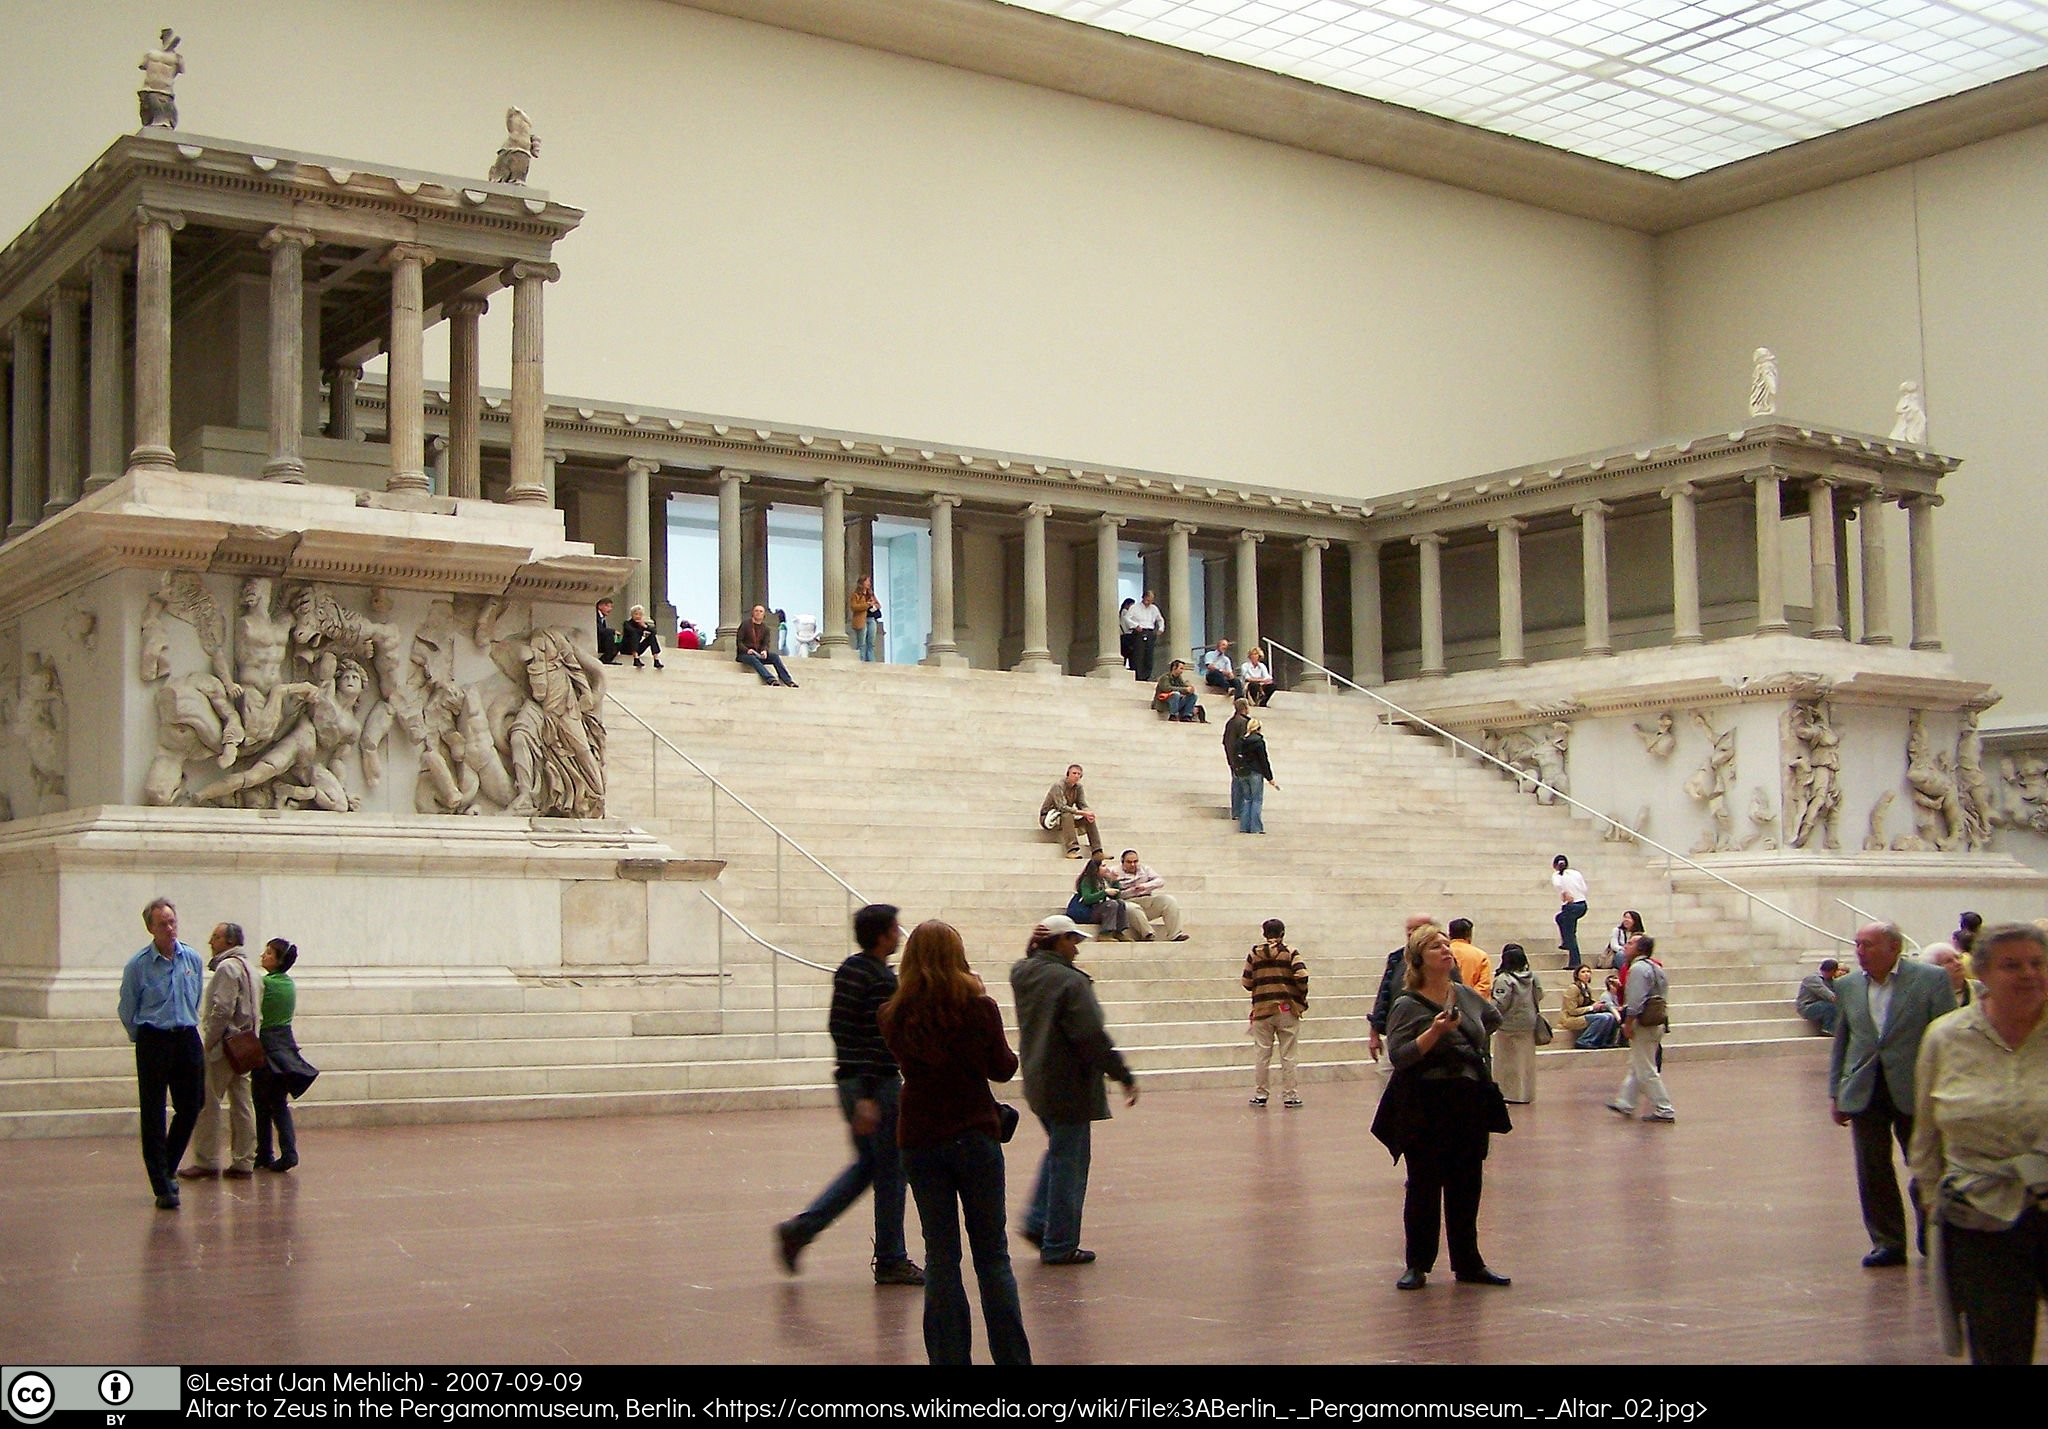 Museum interior with classical sculpture